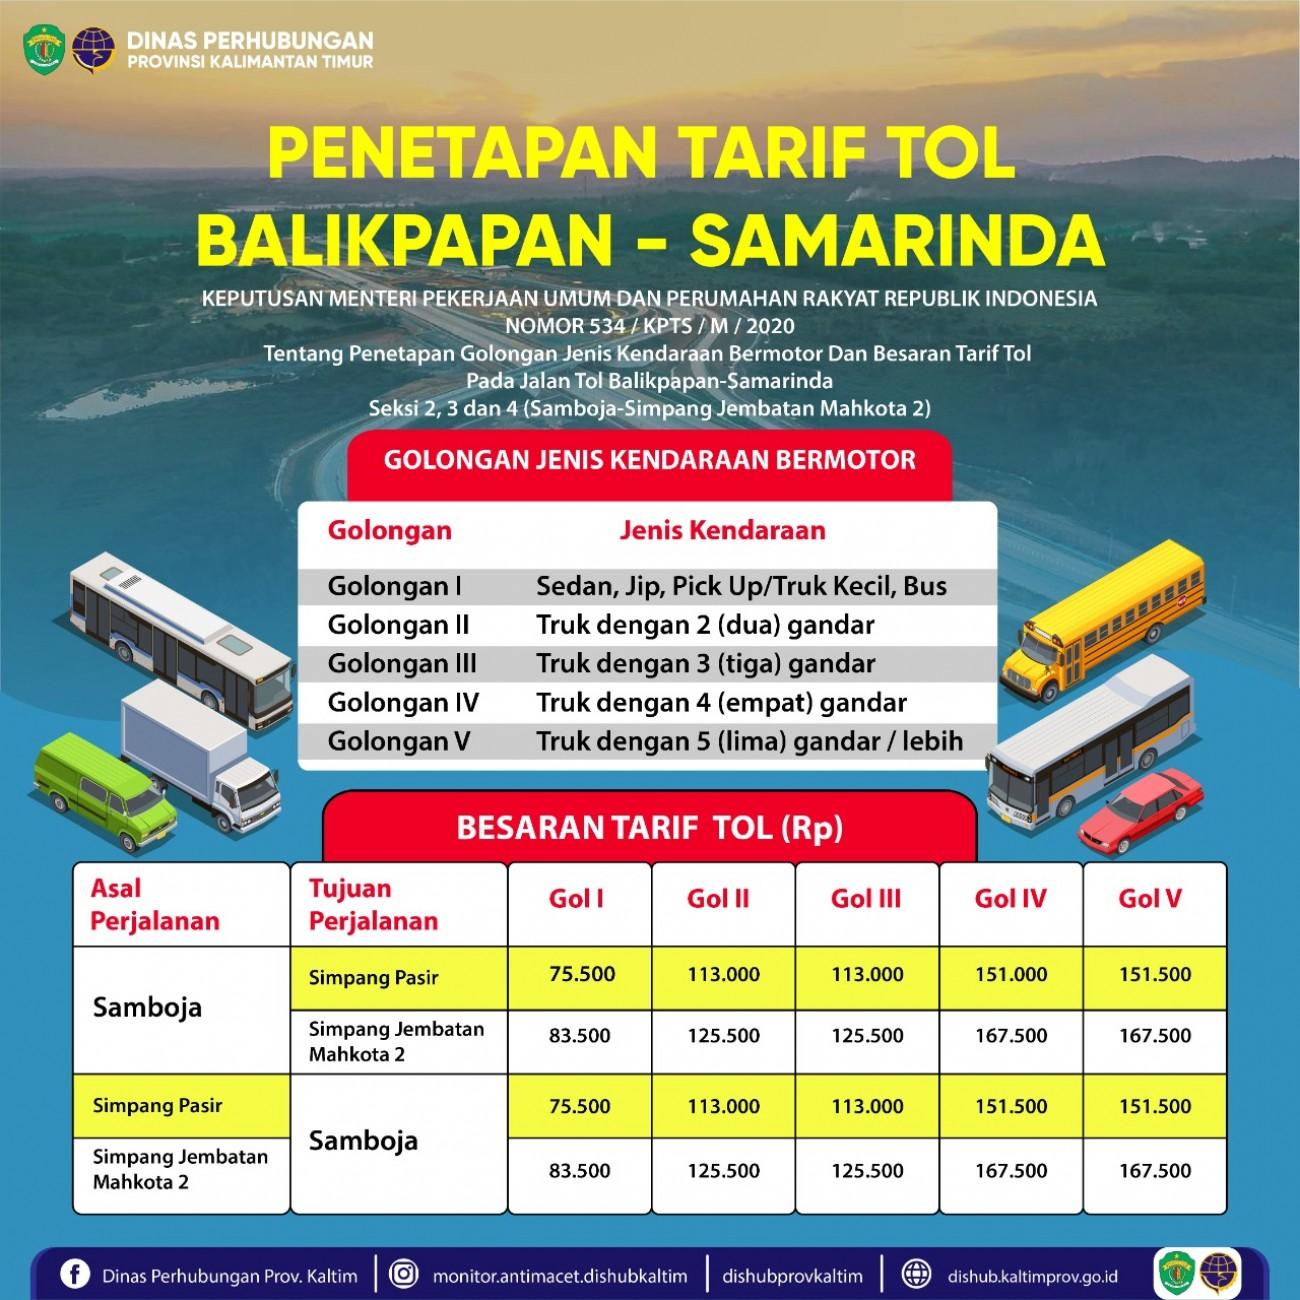 Penetapan Tarif Tol Balikpapan - Samarinda